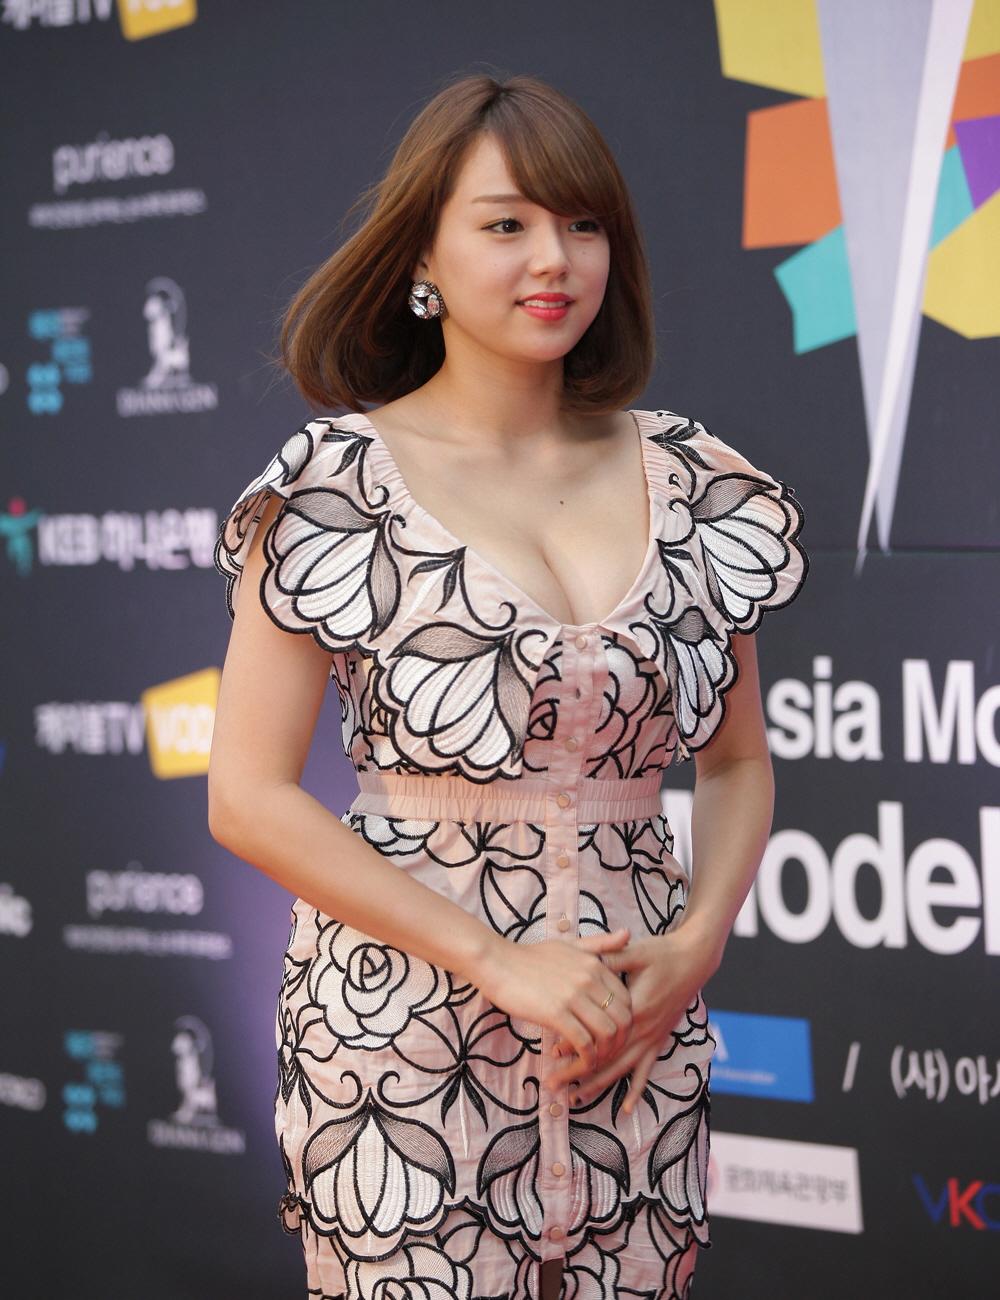 File:시노자키 아이(Shinozaki Ai) 2017 아시아 모델 페스티벌